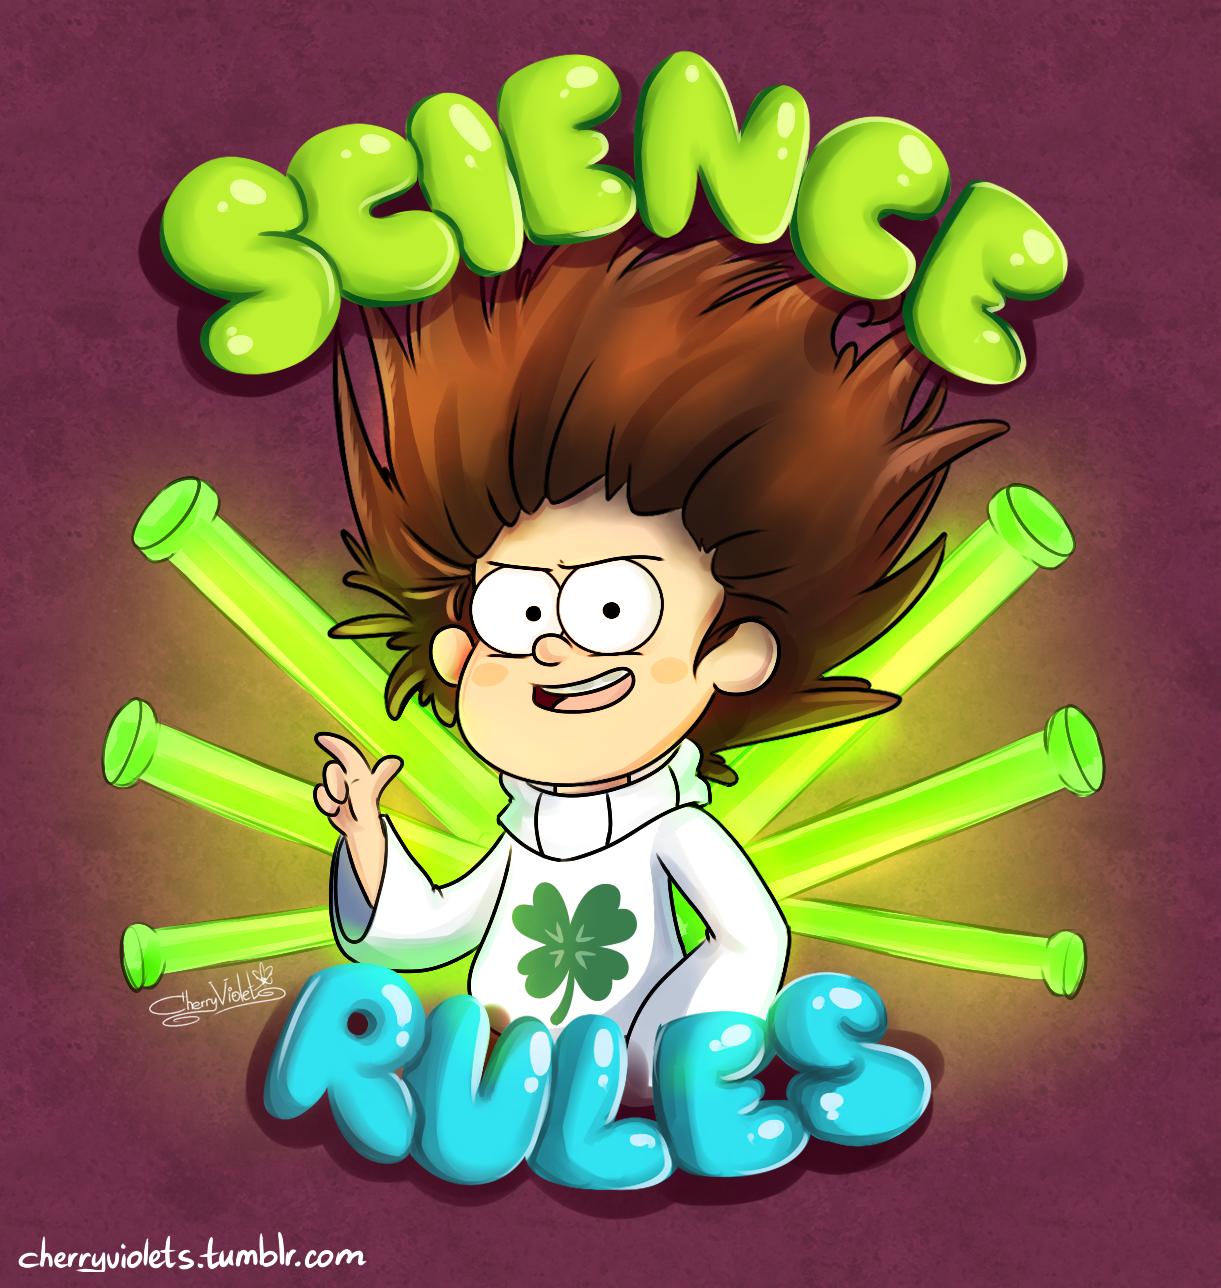 SCIENCE+RULES+by+CherryVioletS.deviantart.com+on+@deviantART